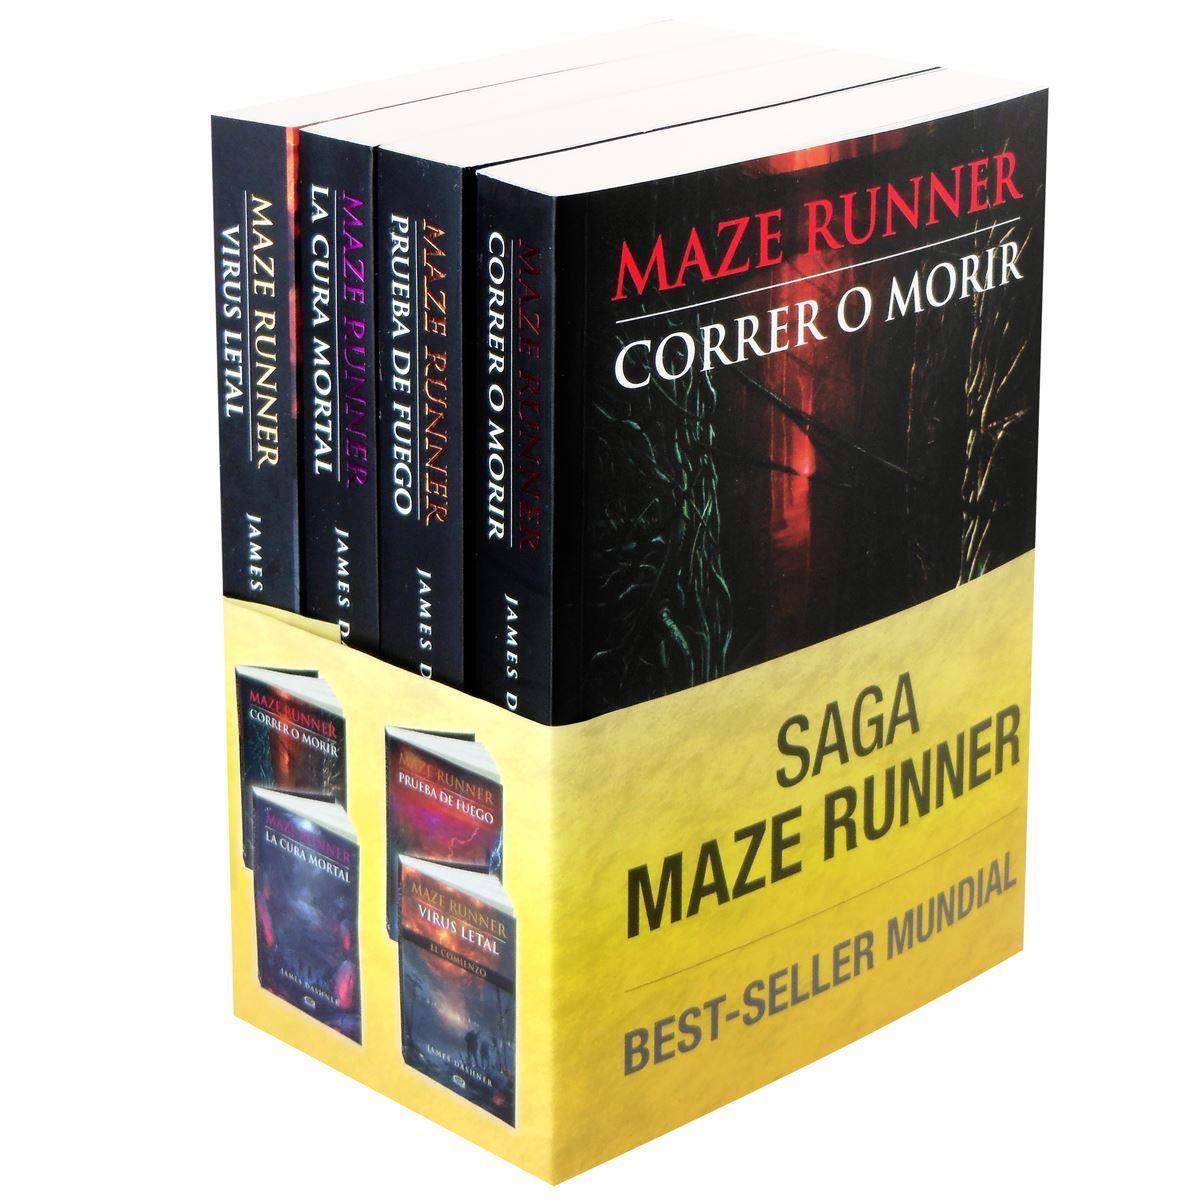 Saga maze runner Libro - Sanborns